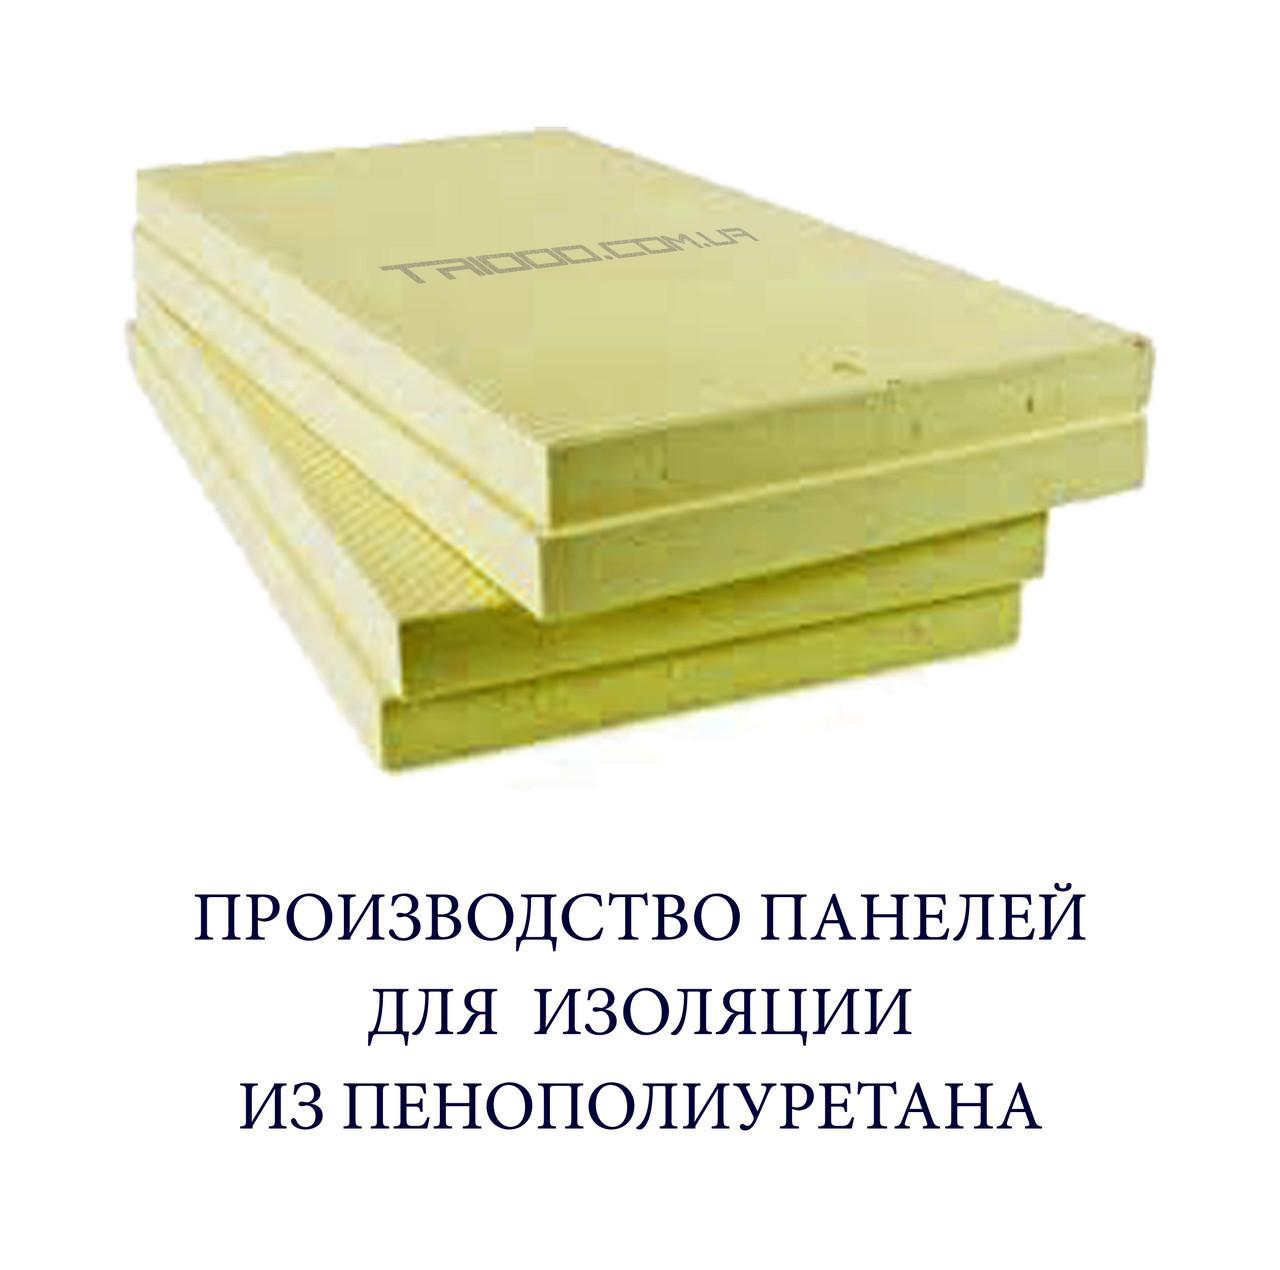 Плита пенополиуретановая (панель ППУ) 600 х 600 х 40 мм